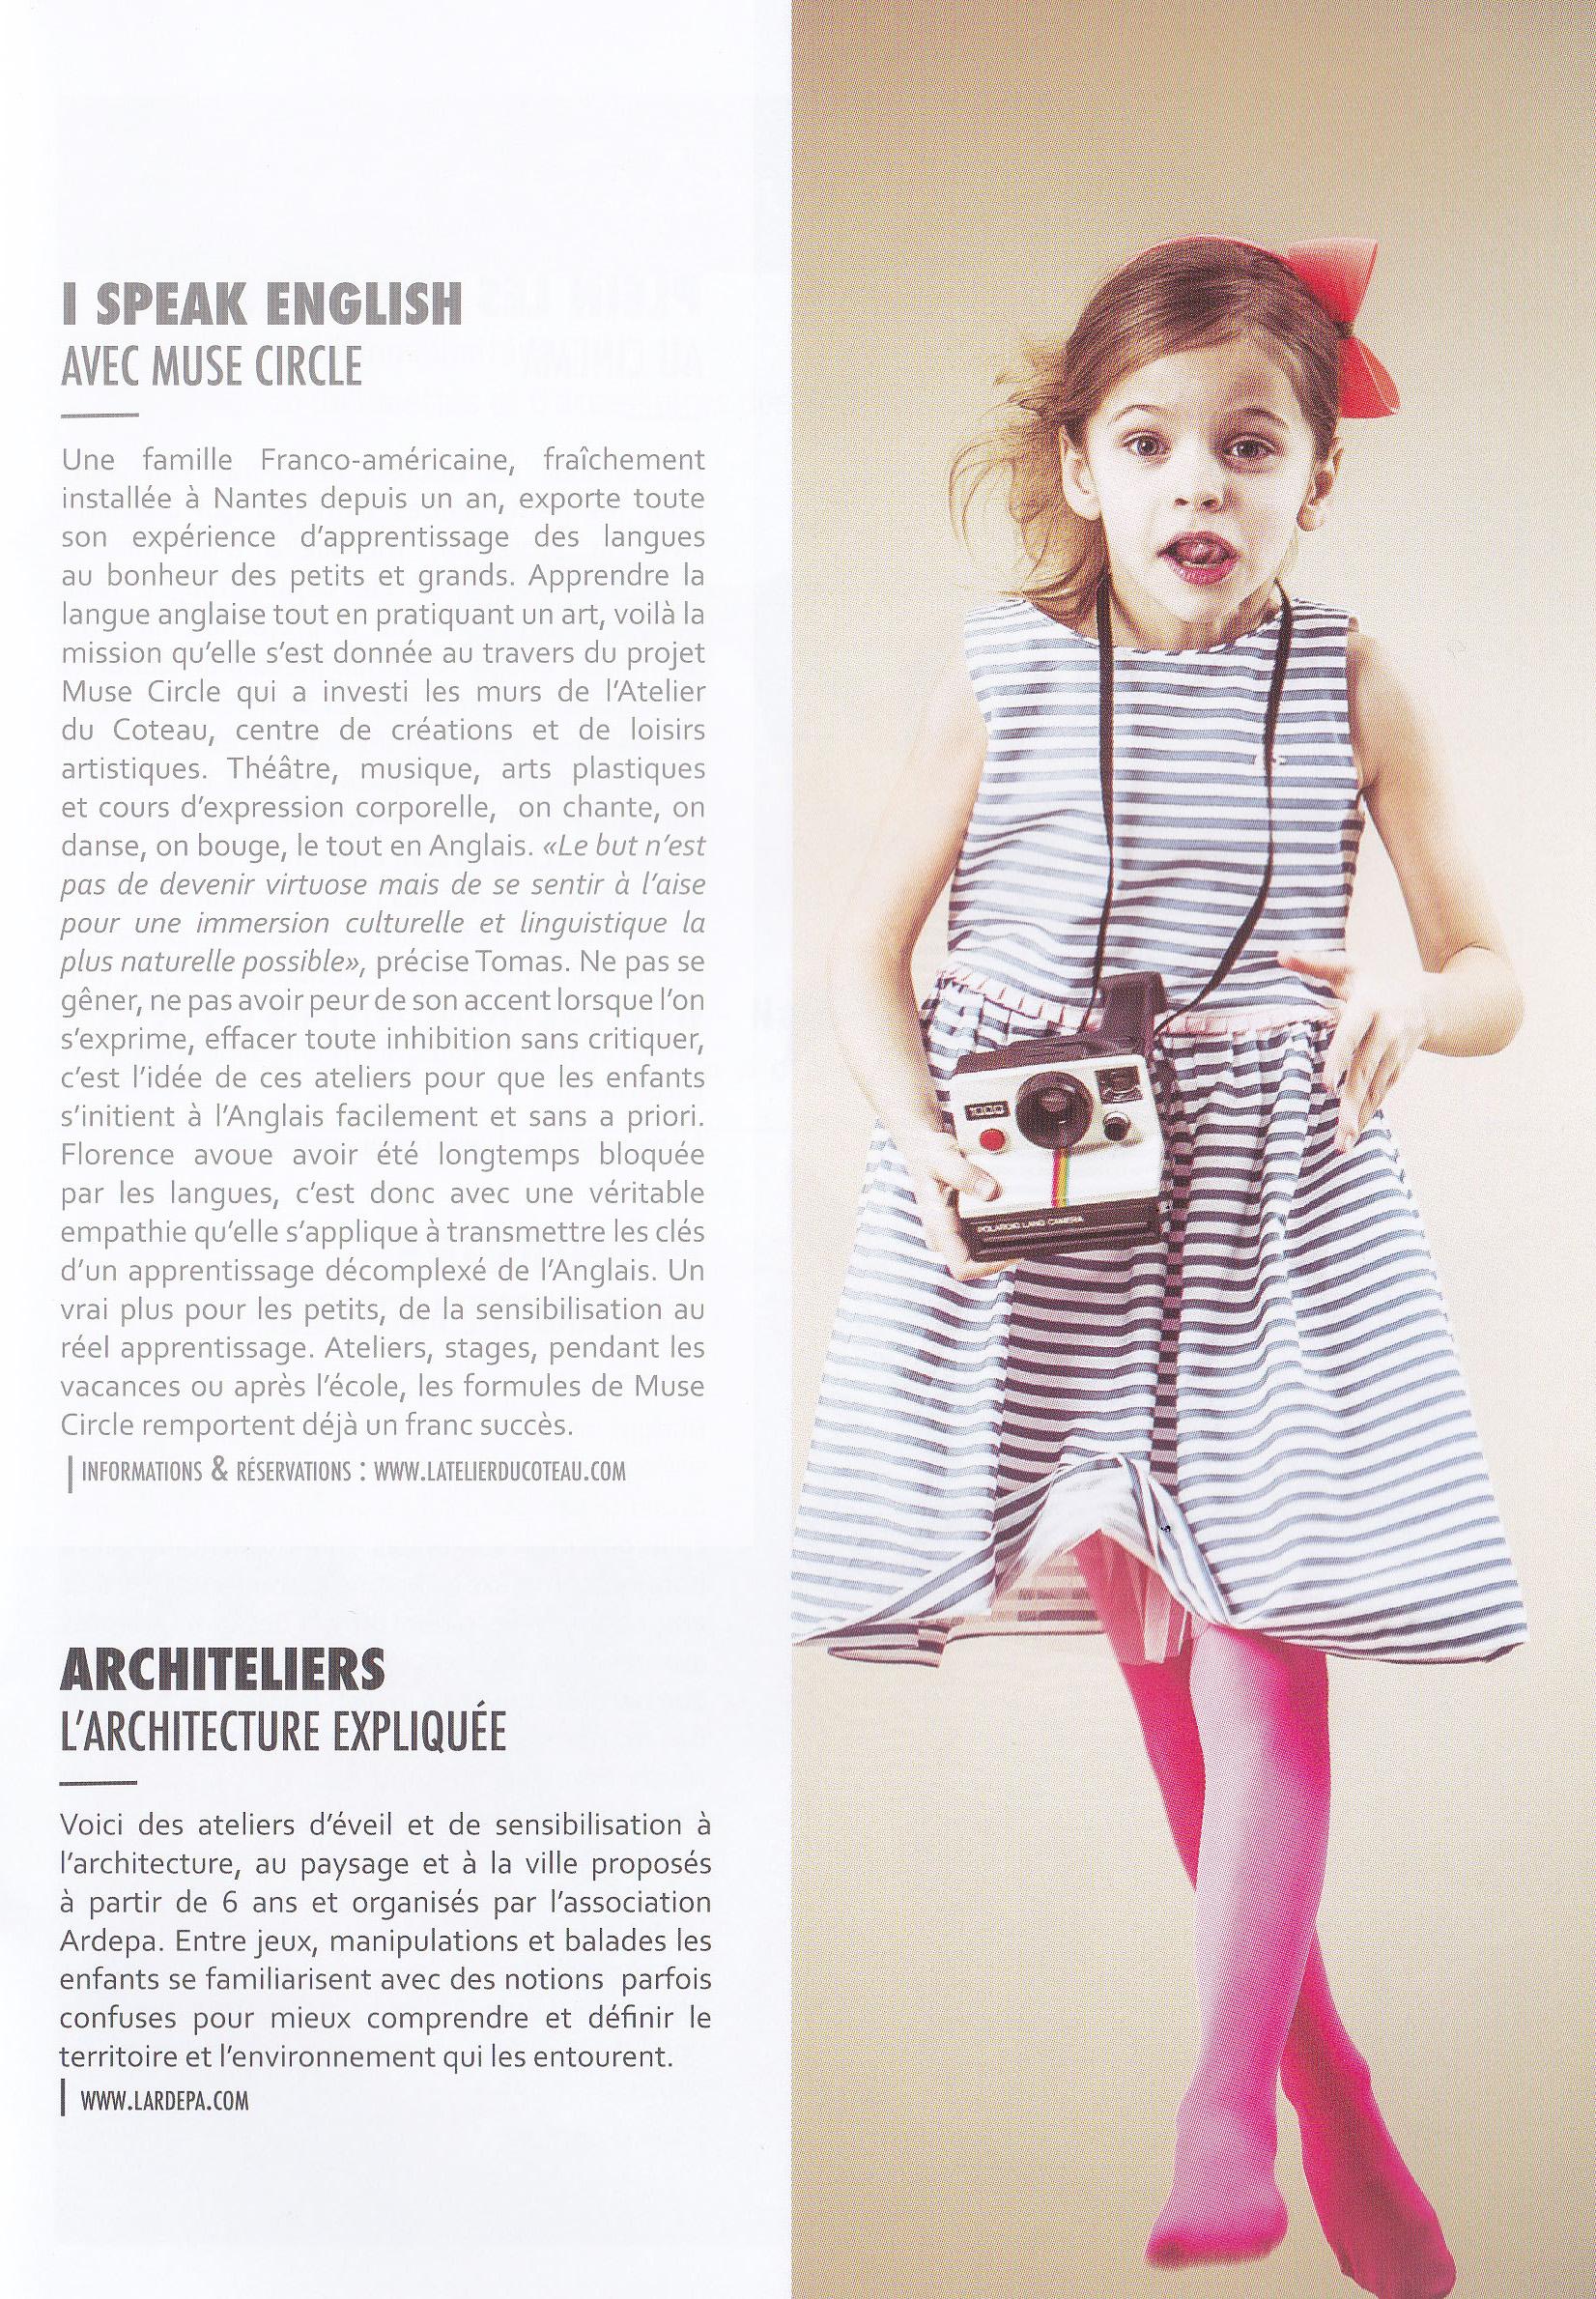 architeclier magazine idîle 2014